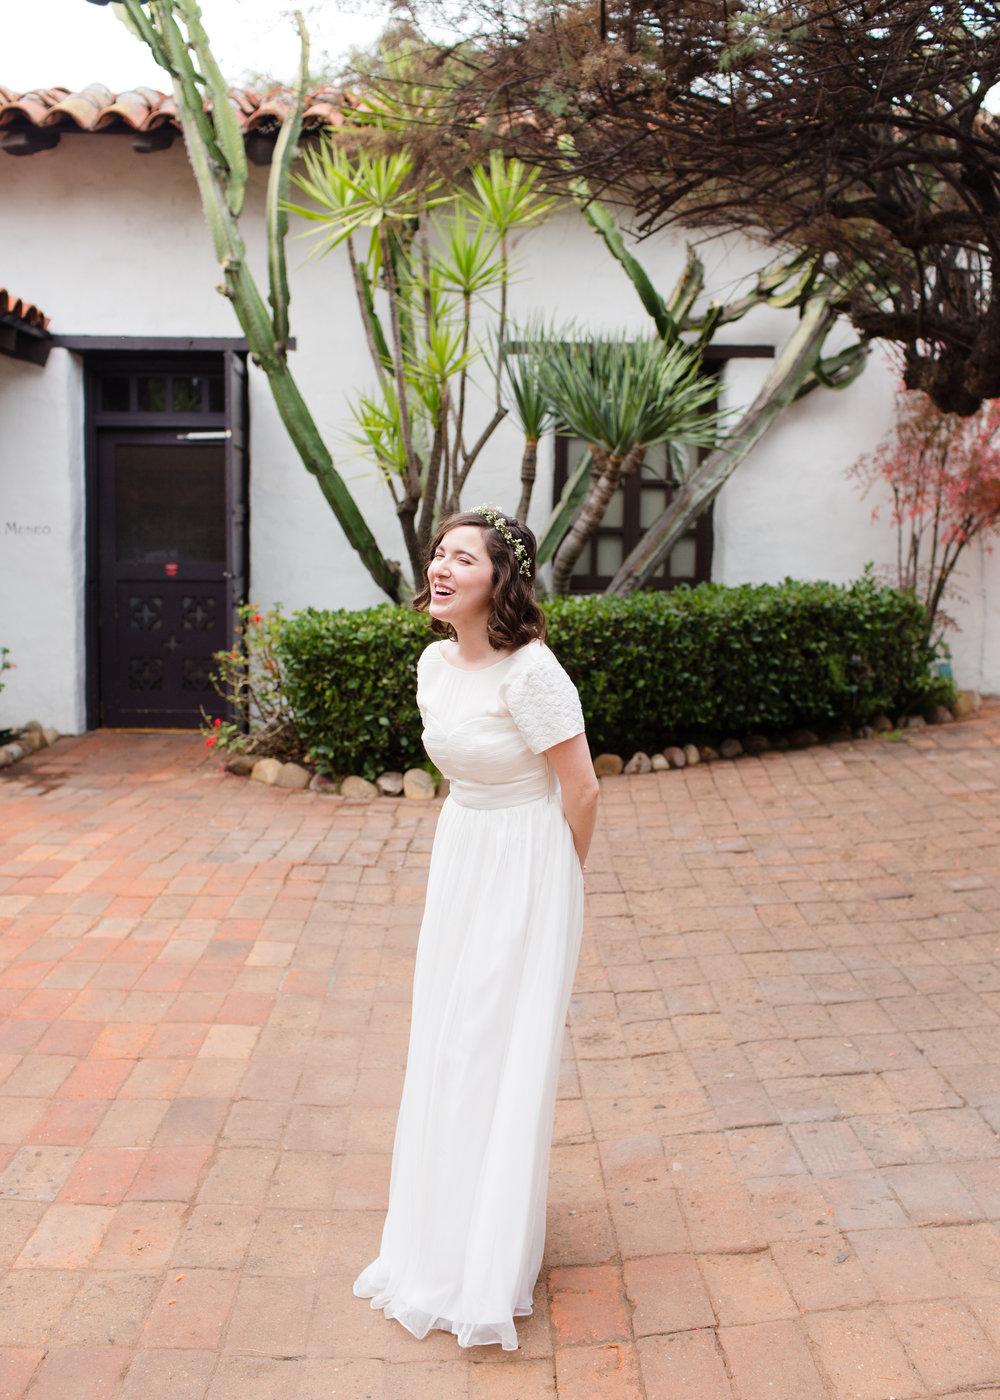 katherine_beth_photography_san_diego_photographer_San_diego_wedding_photographer_san_diego_mission_020.jpg